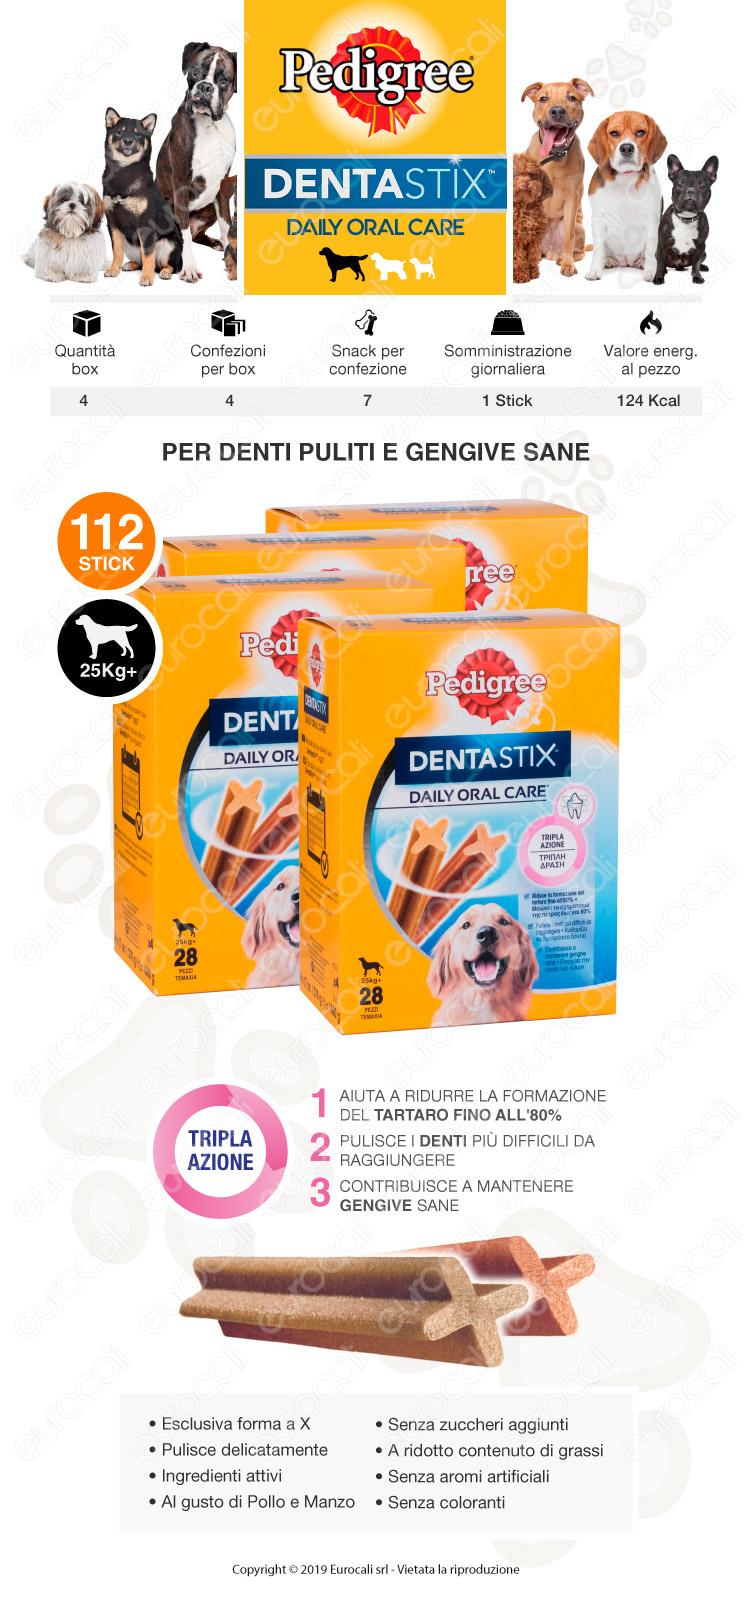 Pedigree Dentastix Large per l'igiene orale del cane 4 Confezione da 28 Stick